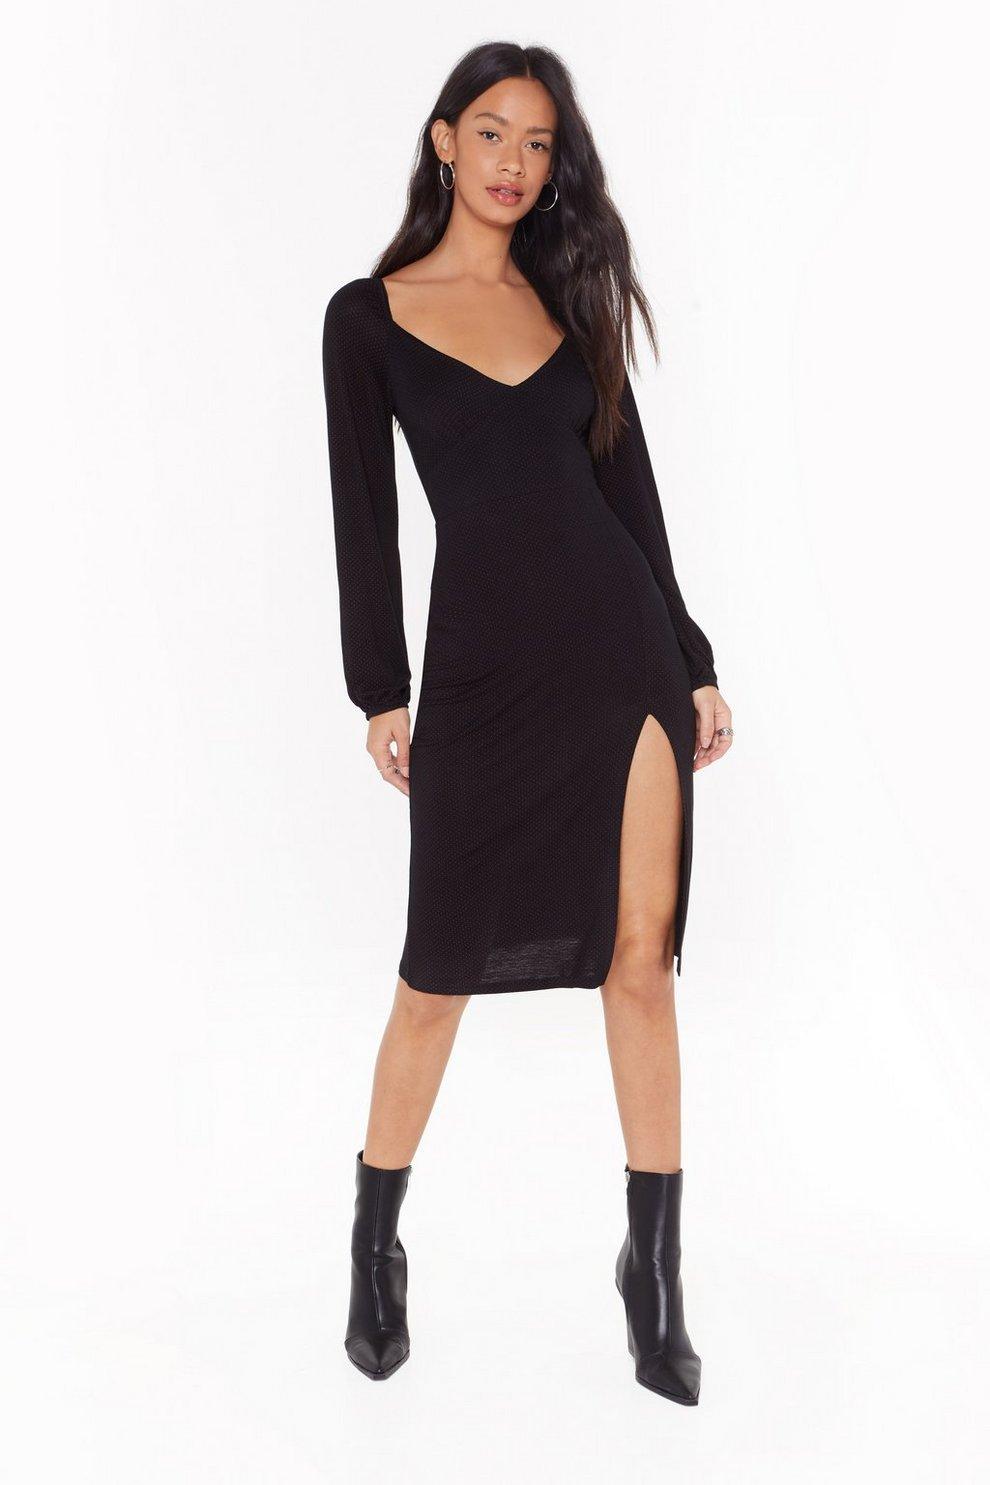 0f083998458f7 Livin' for the Spotlight Polka Dot Midi Dress